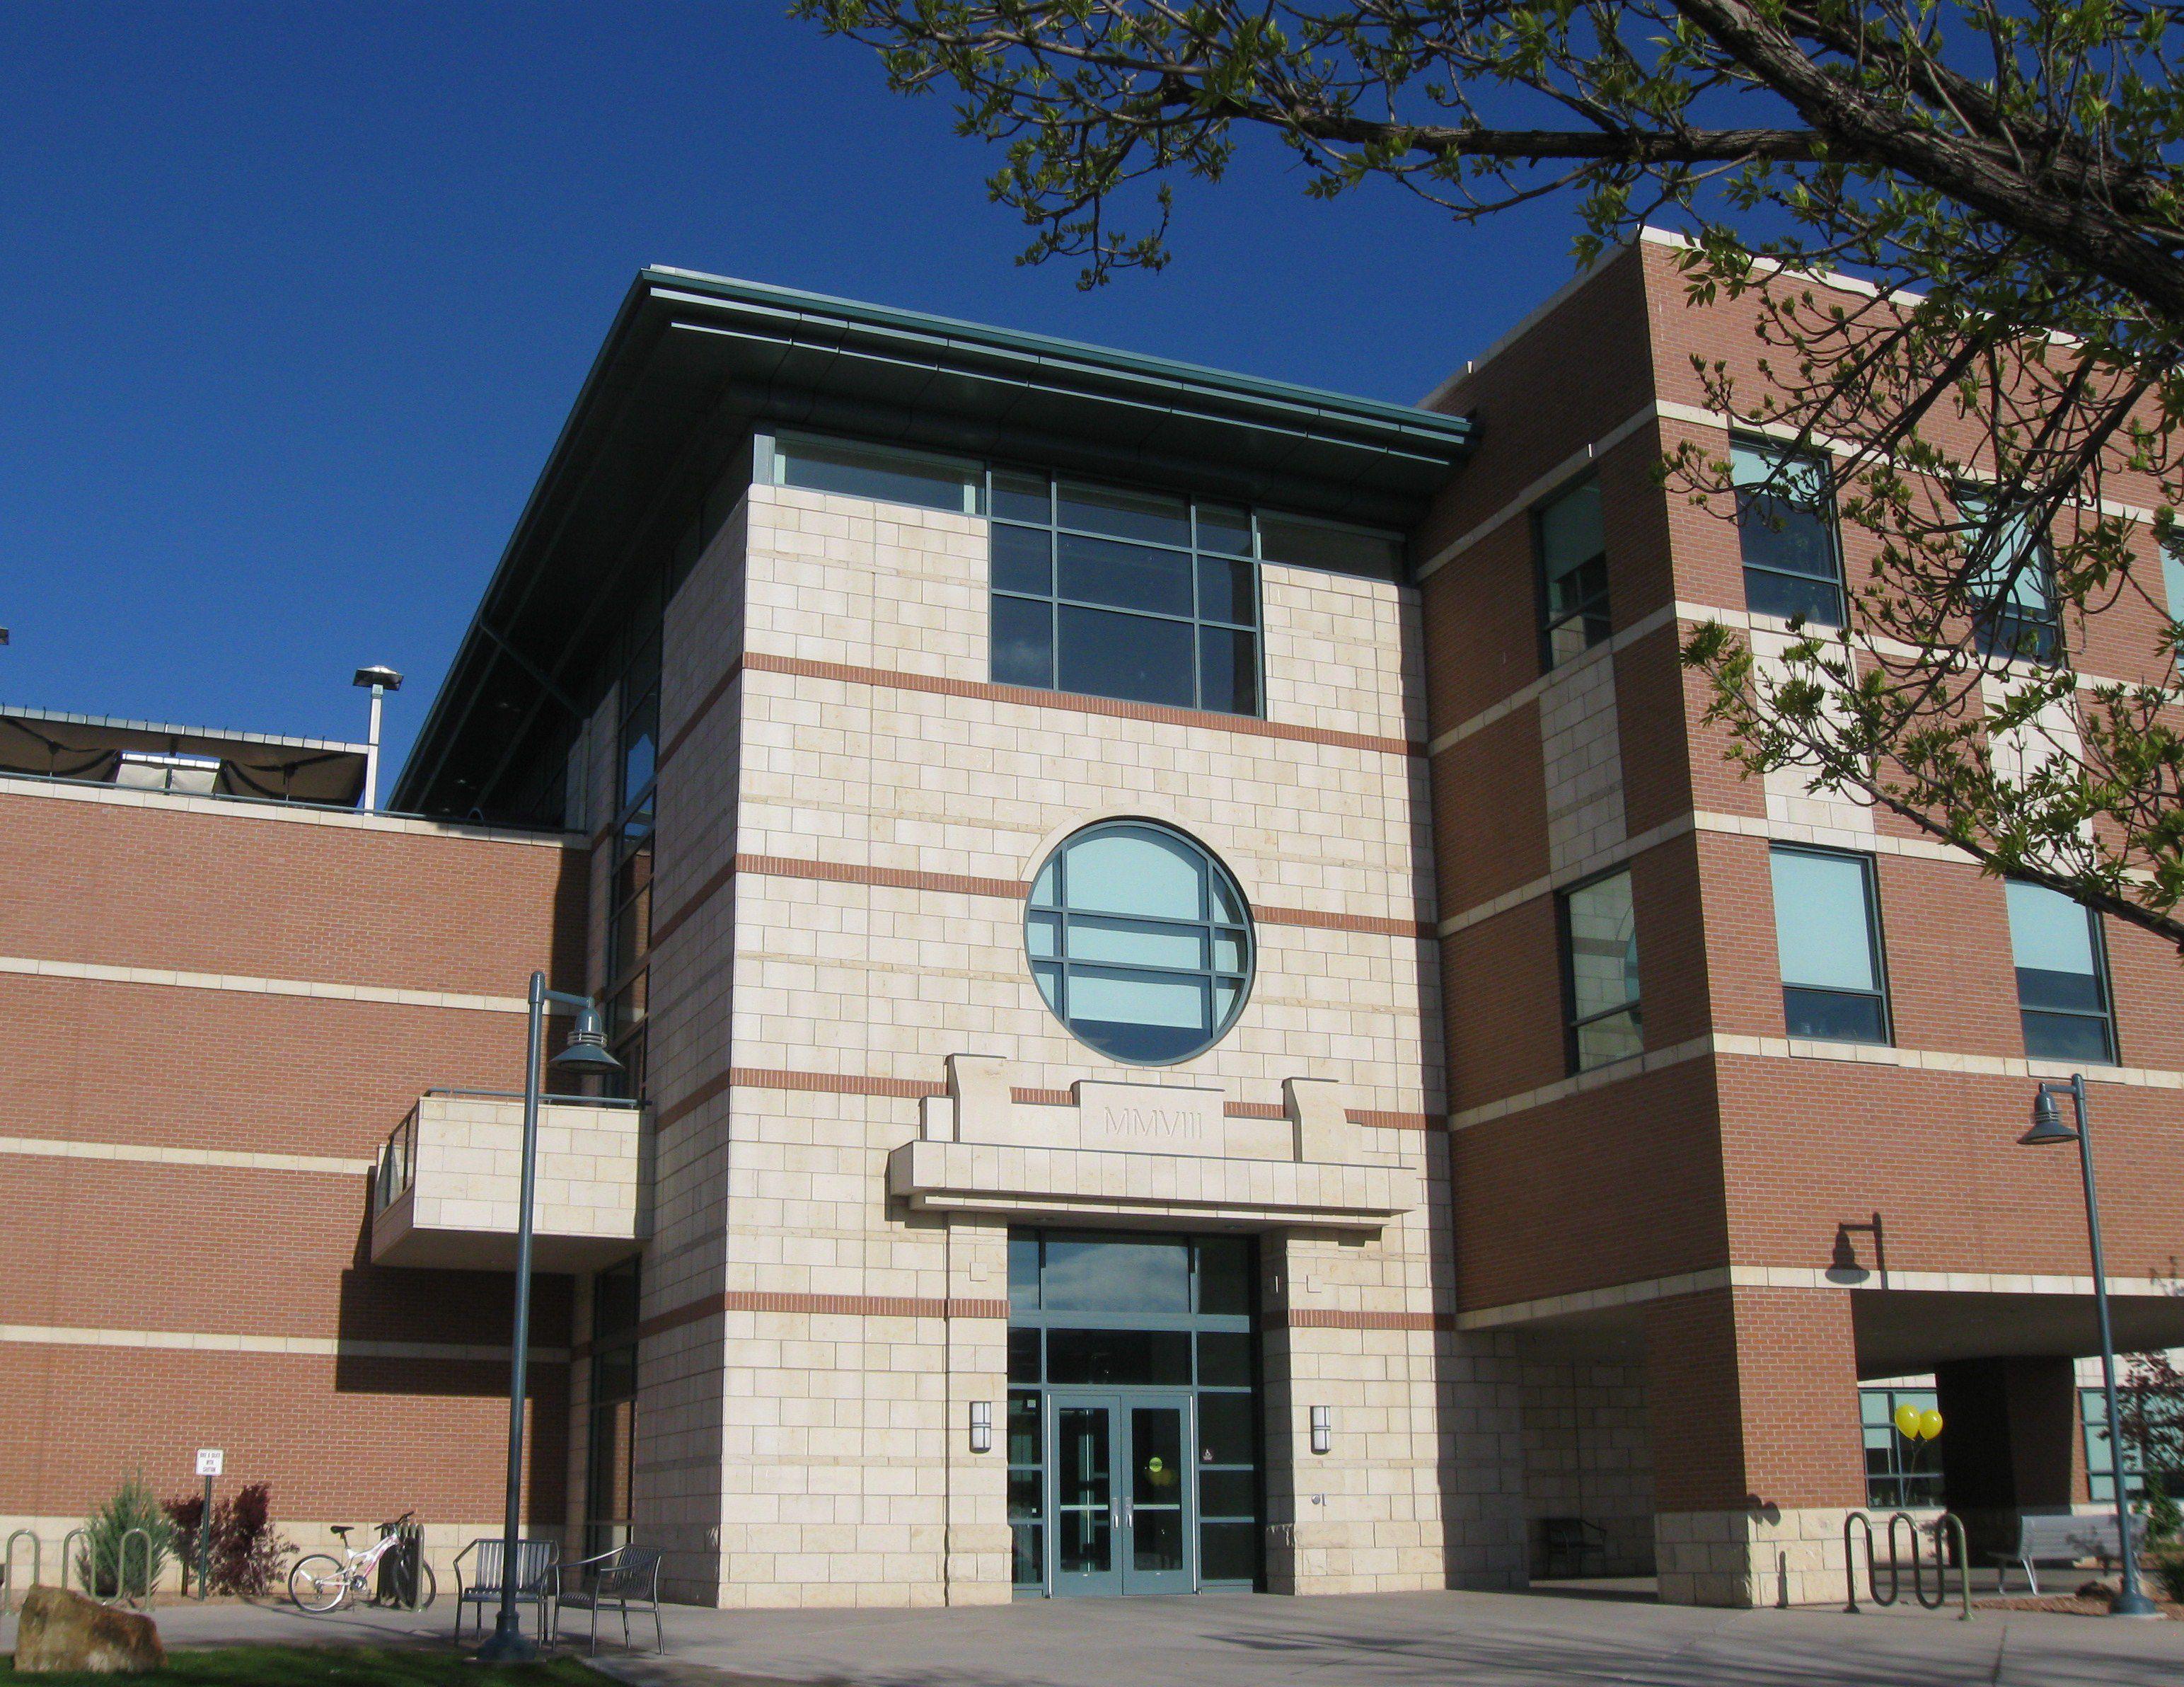 ACB (Academic Classroom Building) at Colorado Mesa University